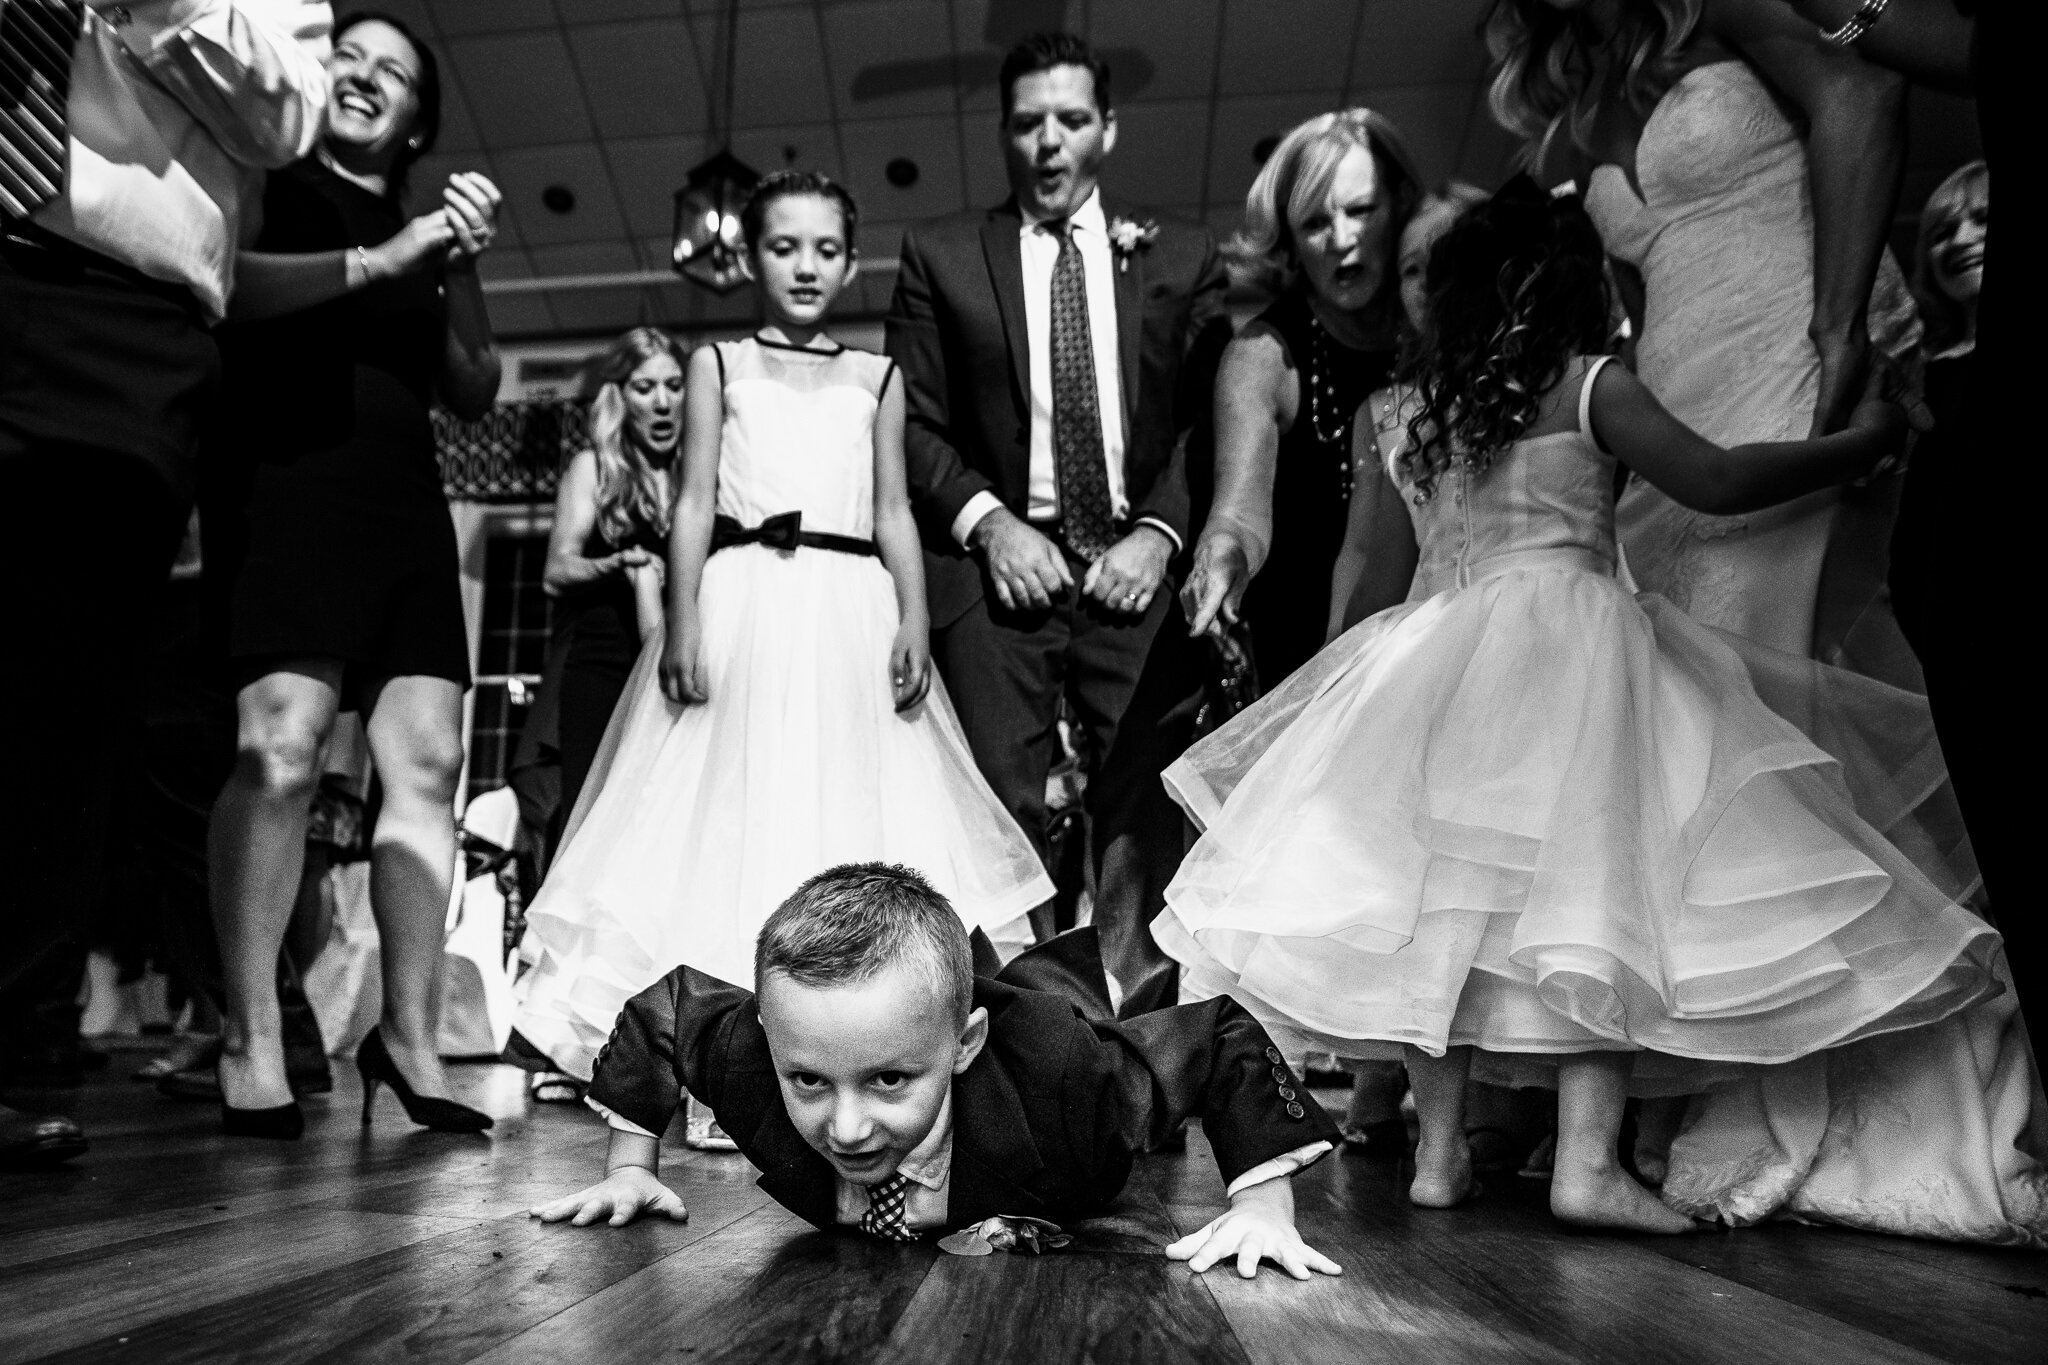 Snell-Ocean-City-Yacht-Club-New-Jersey-Wedding-Photographer-33.JPG